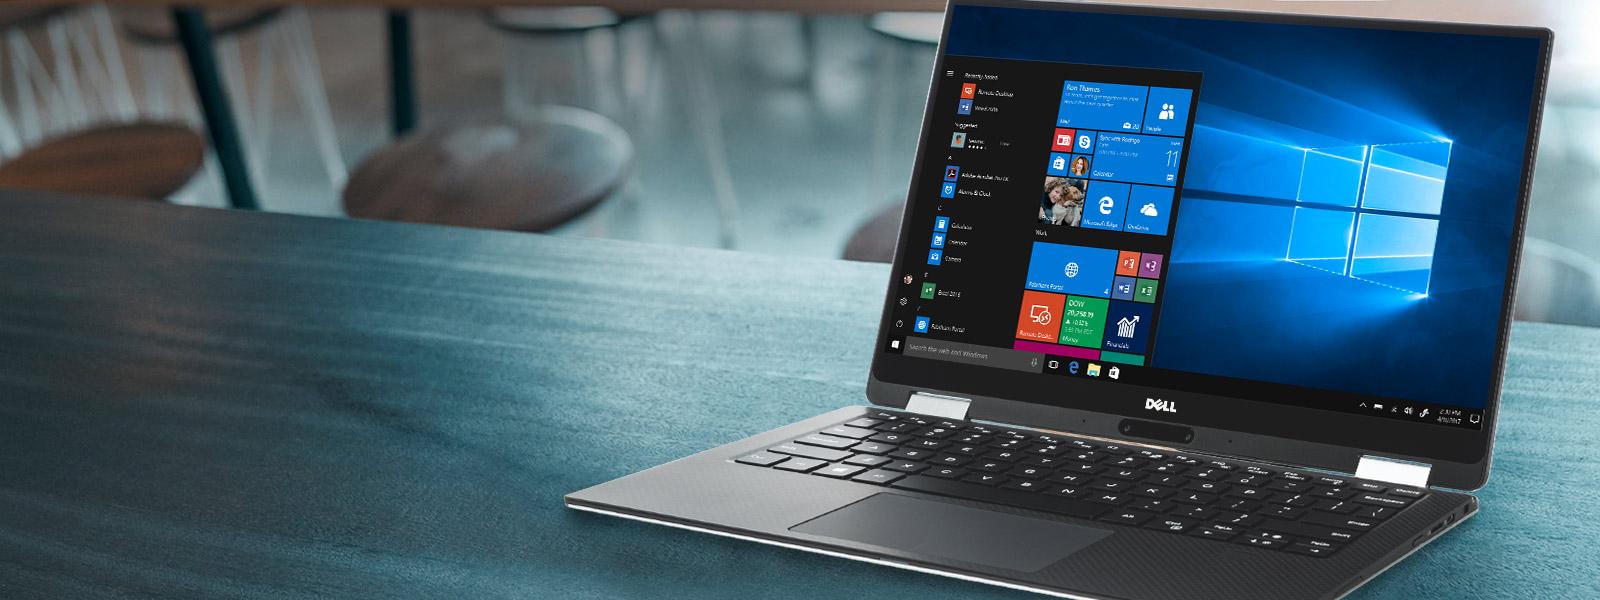 Меню «Пуск» Windows 10 на экране ноутбука